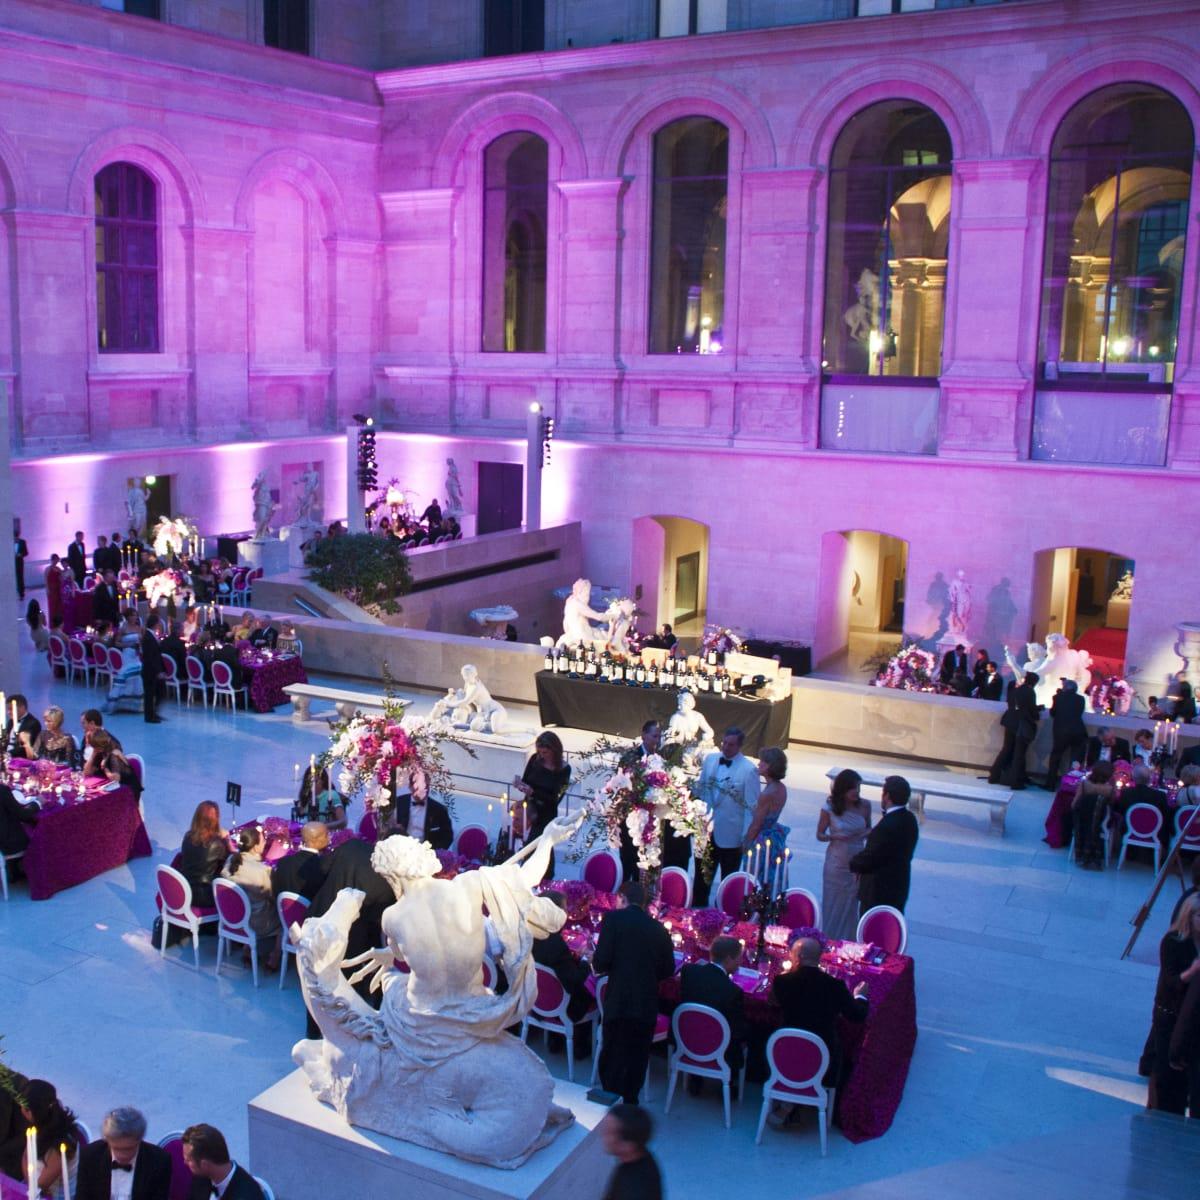 News_Louvre_party interiors_JUne 2011